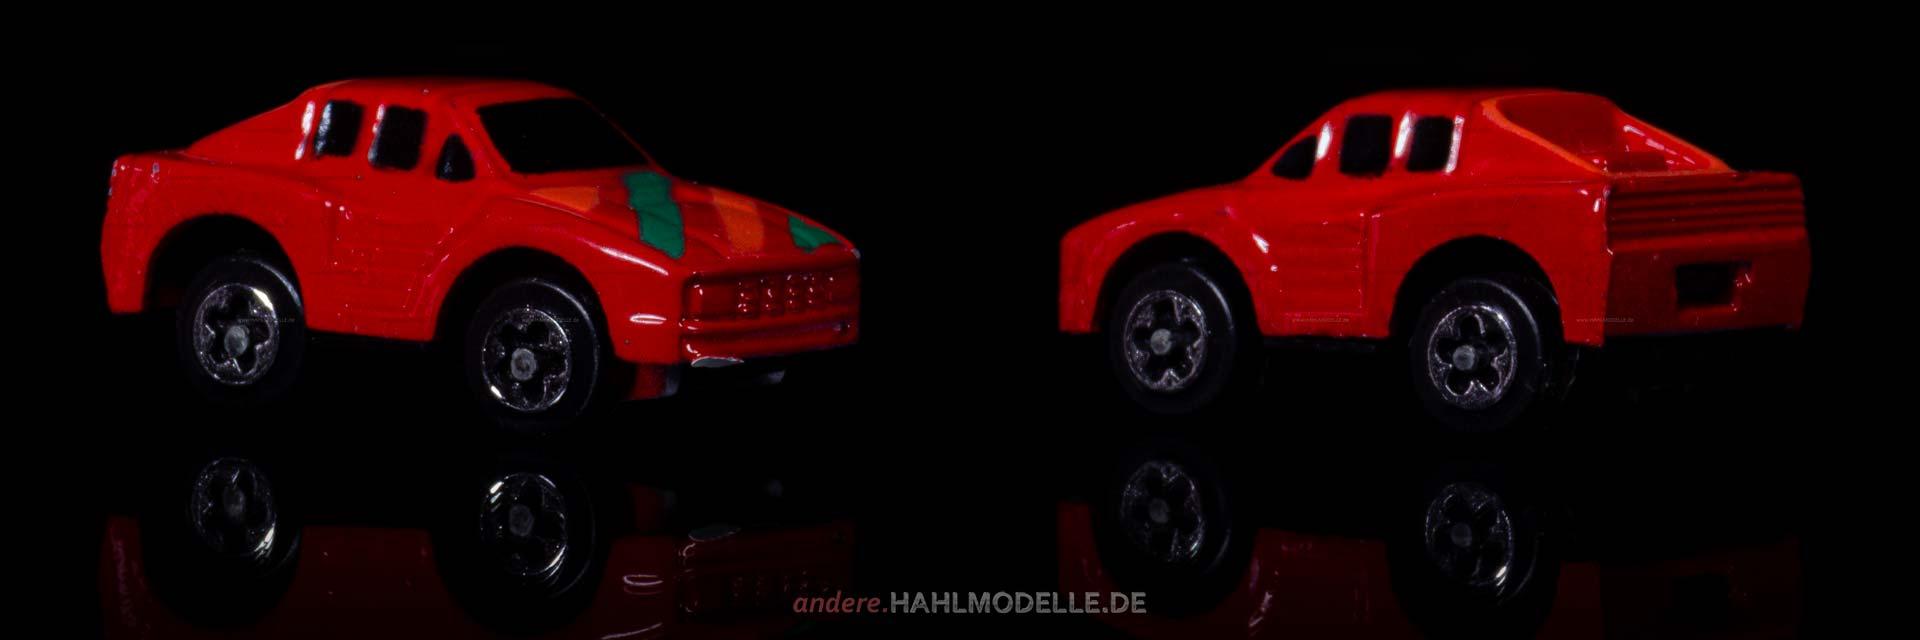 Fantasiemodell unbekannter Herkunft | www.andere.hahlmodelle.de